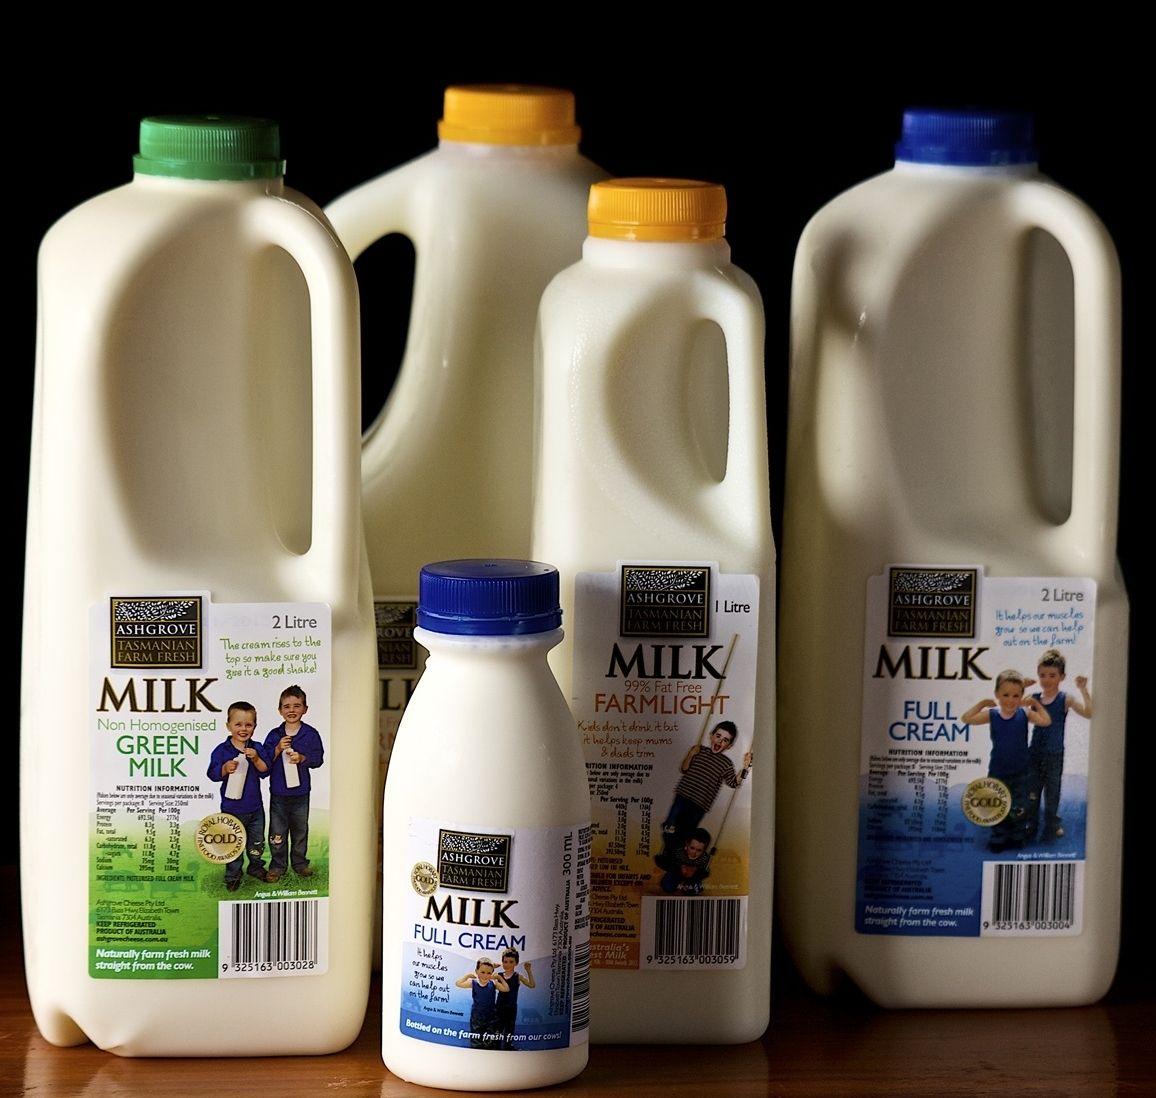 Ashgrove Tasmanian Farm Milk straight from the cow nothing